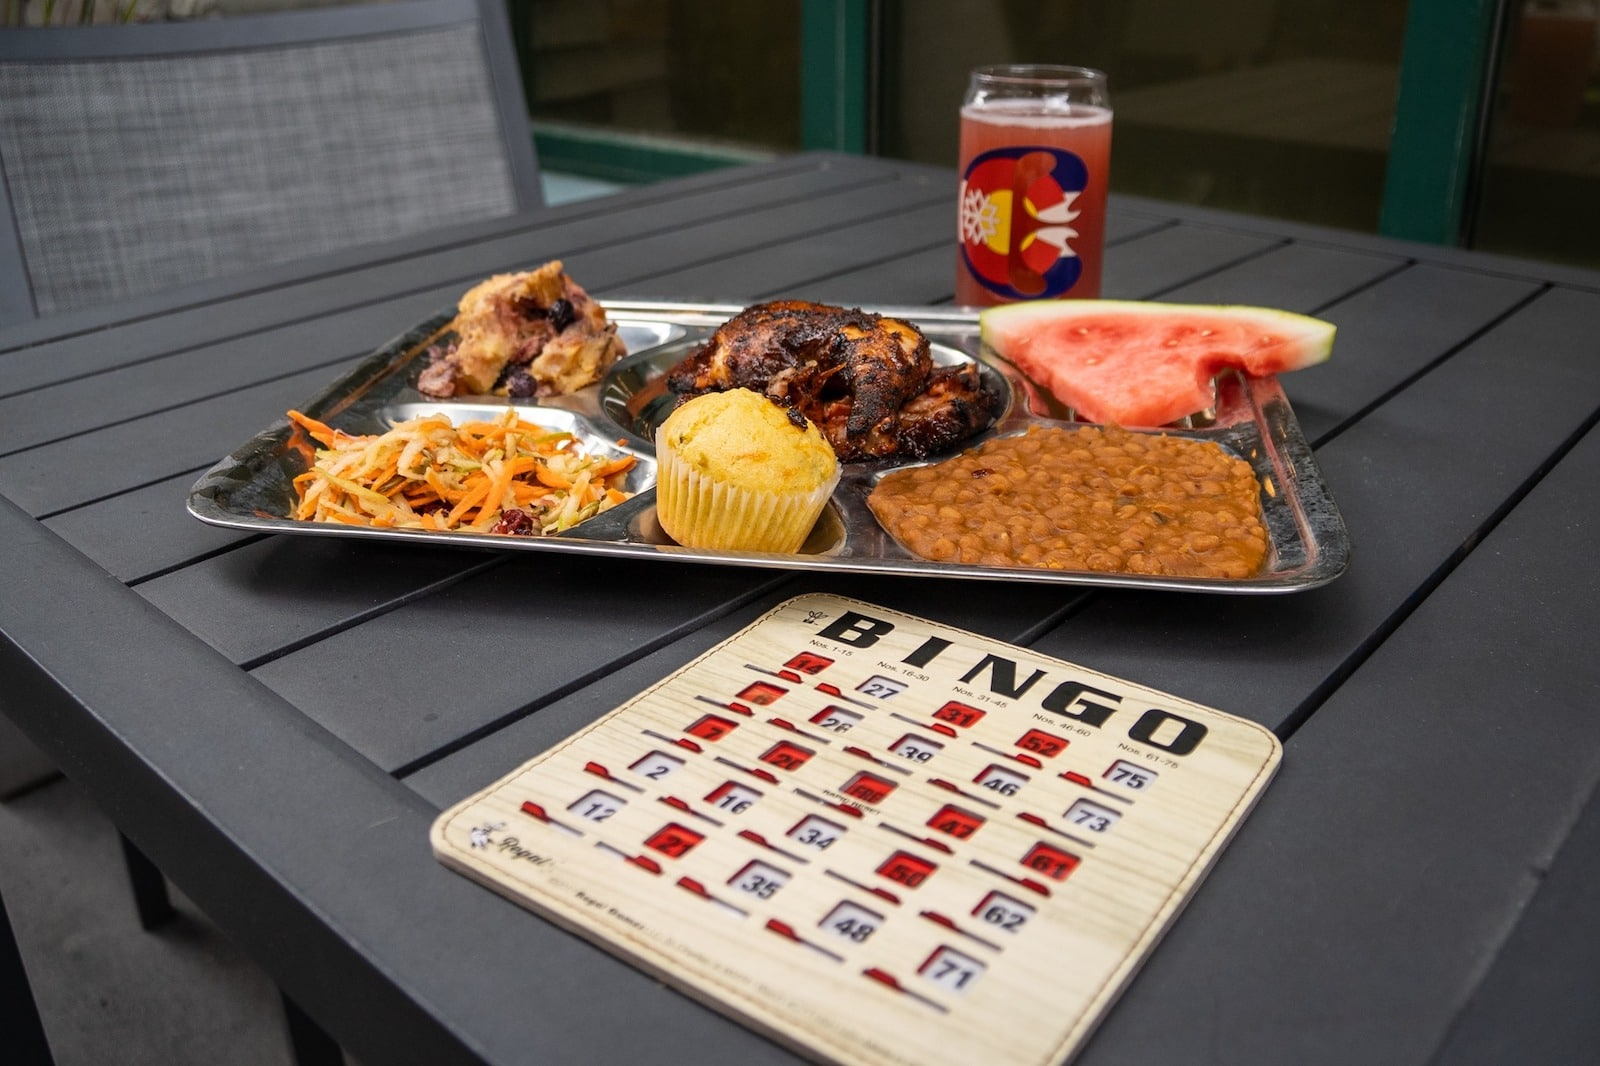 Gambar bir, kartu bingo, dan BBQ di Copper Mountain, Colorado